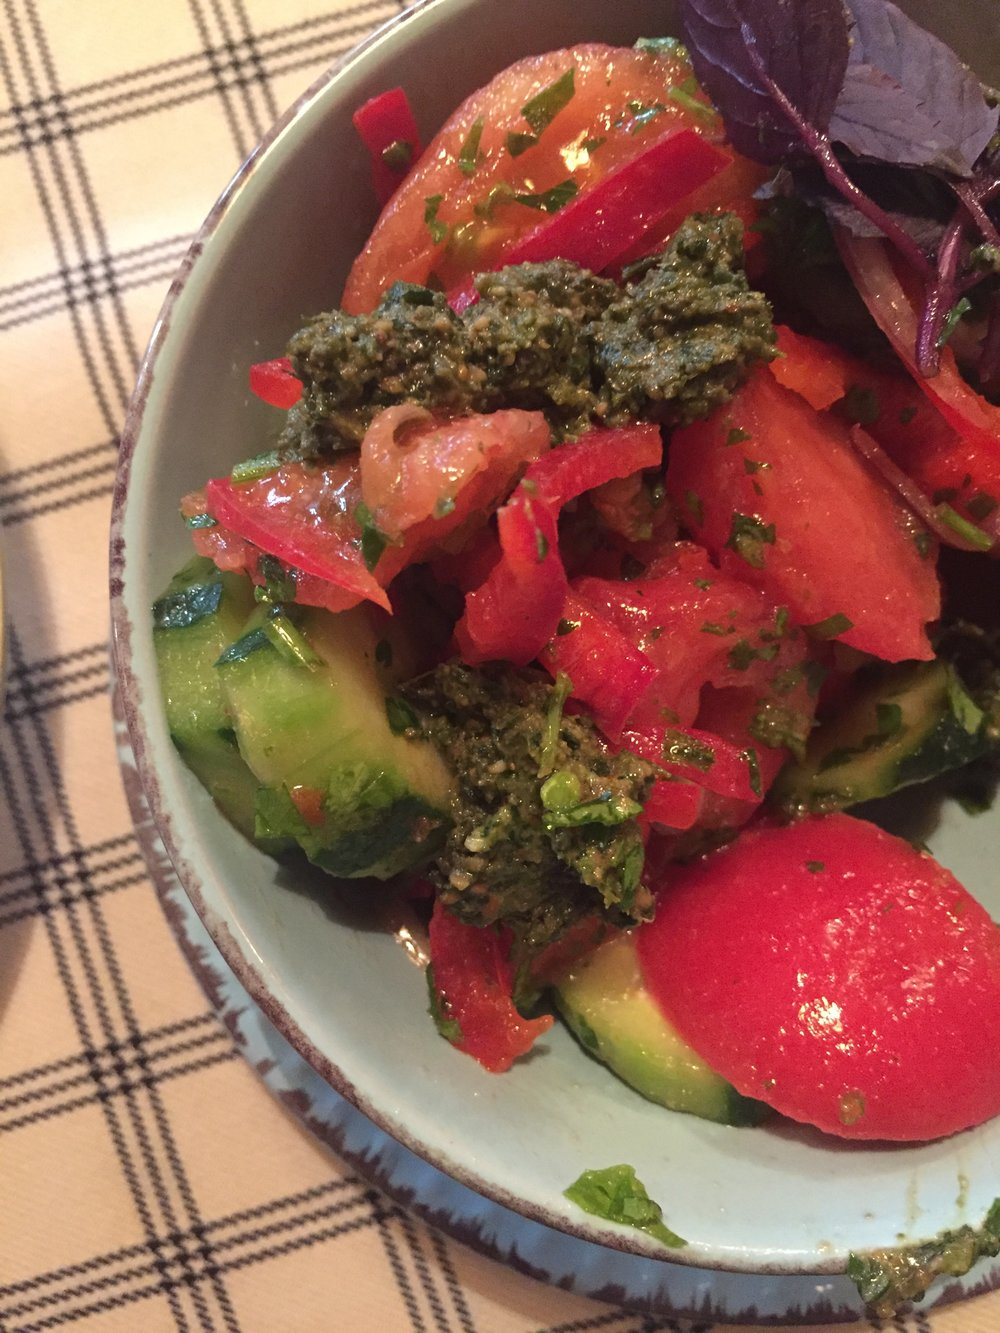 Tomato & Cucumber Salad!